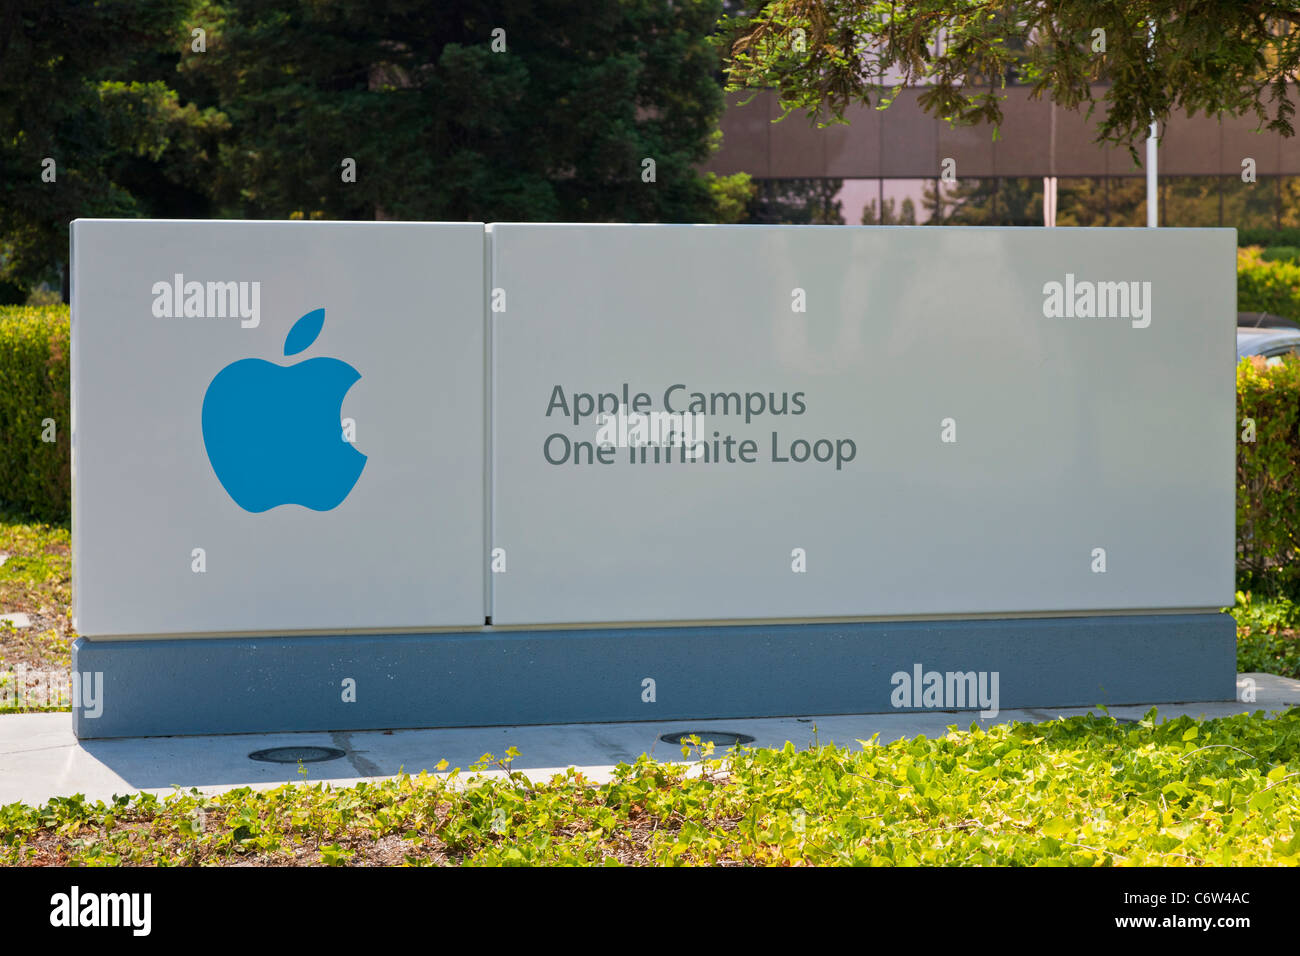 Apple logo outside Apple Incorporated's corporate headquarters at 1-6 Infinite Loop, Cupertino, California, USA. JMH5193 Stock Photo